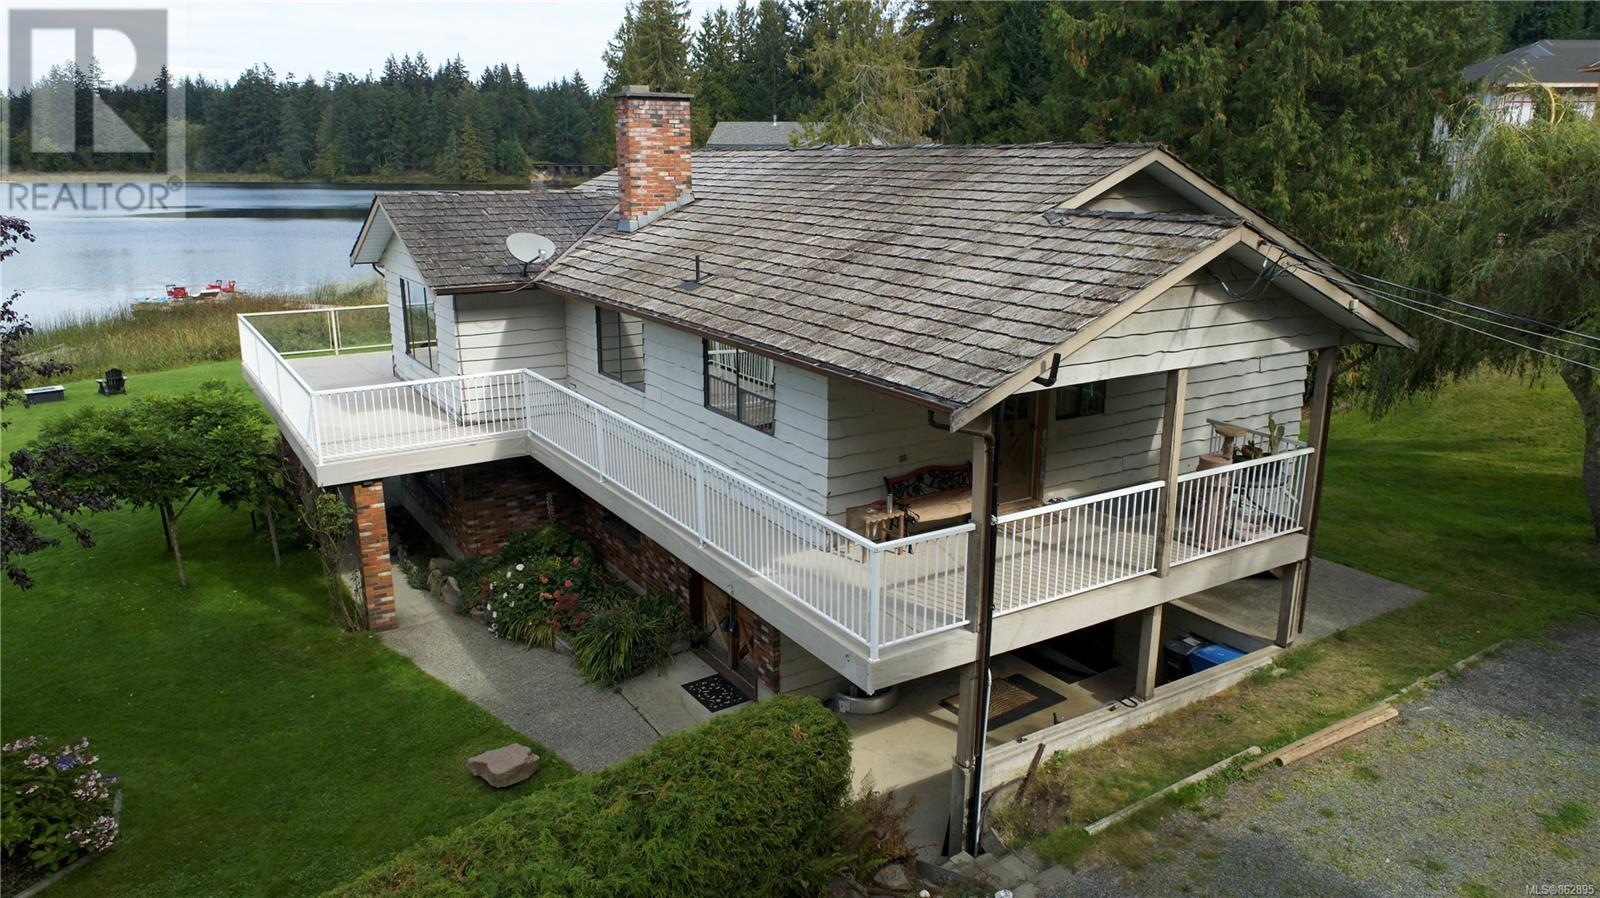 6690 Jenkins Rd, Nanaimo, British Columbia  V9T 6G8 - Photo 34 - 862895